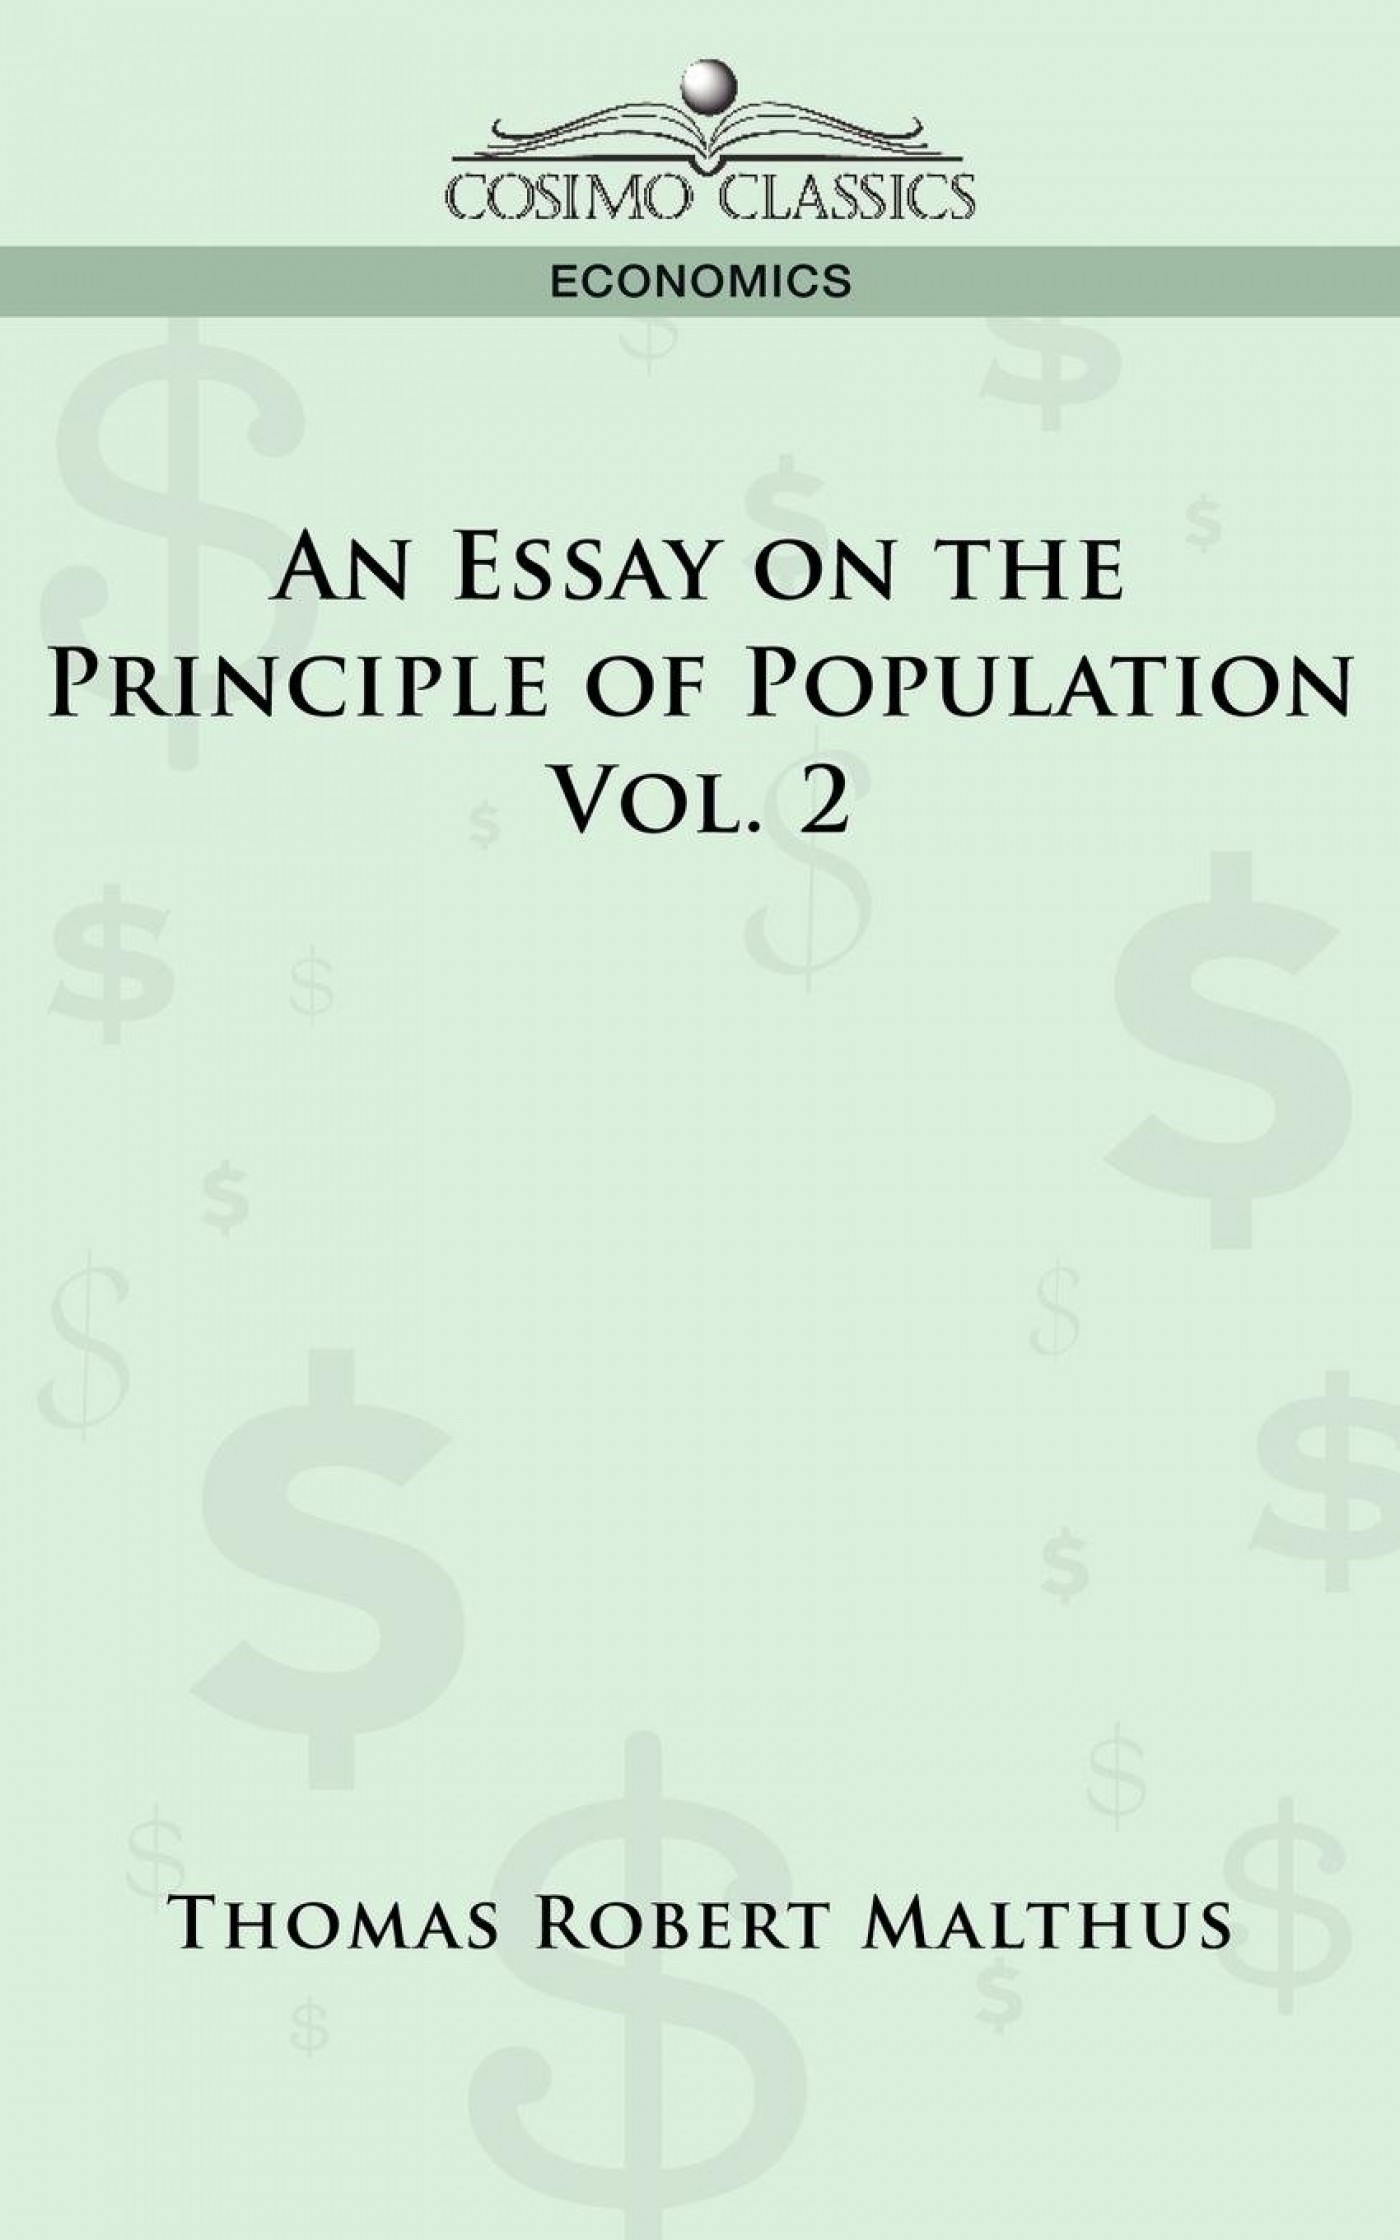 009 Essay On The Principle Of Population Example Singular Malthus Sparknotes Thomas Main Idea 1400